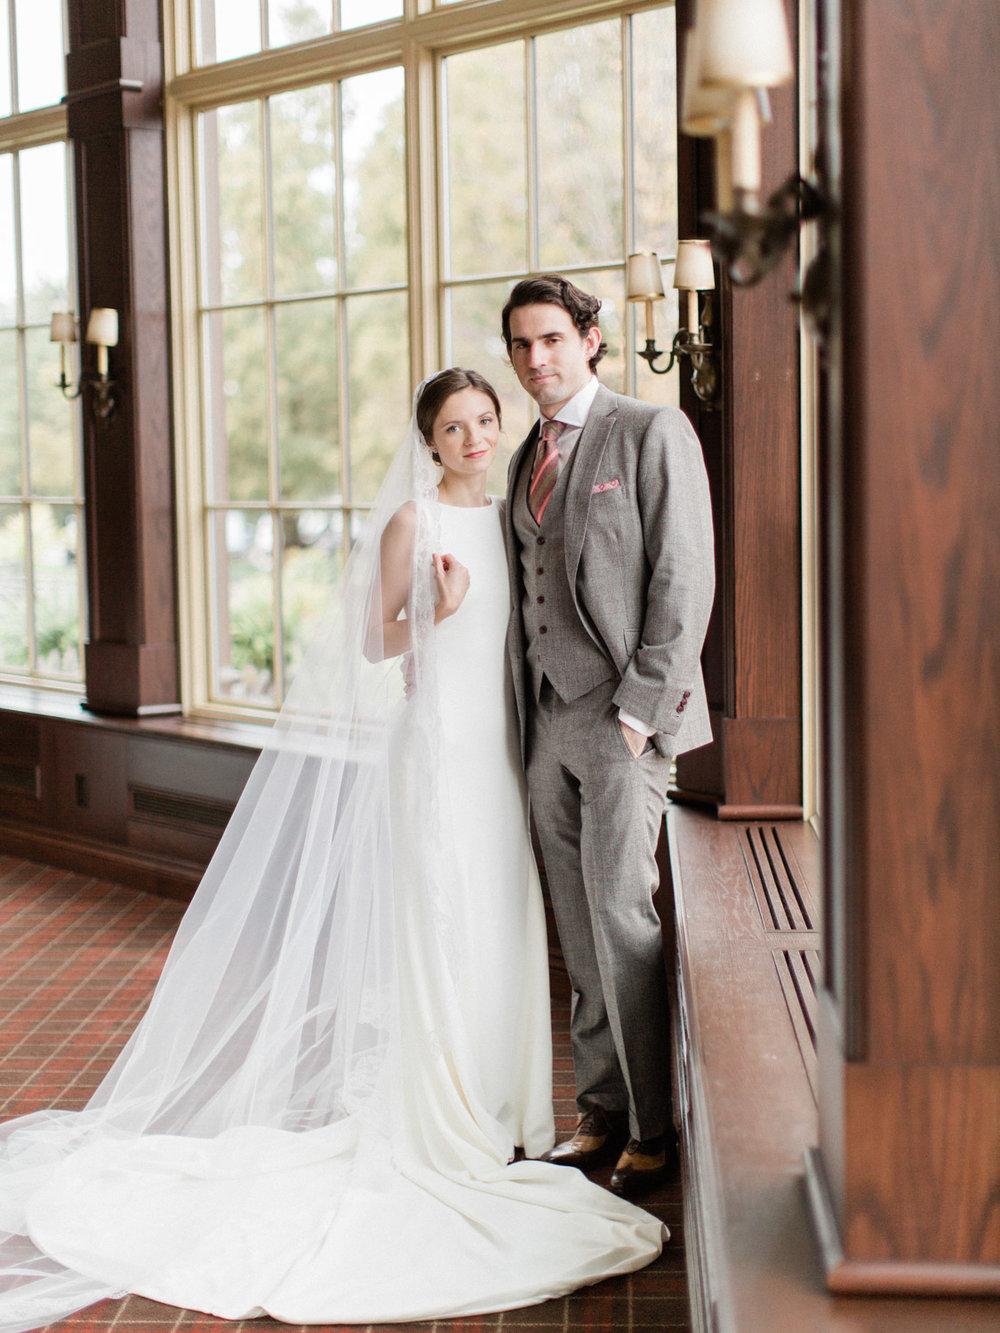 Toronto-wedding-photographer-st-georges-golf-club-jewish-modern-fall41.jpg